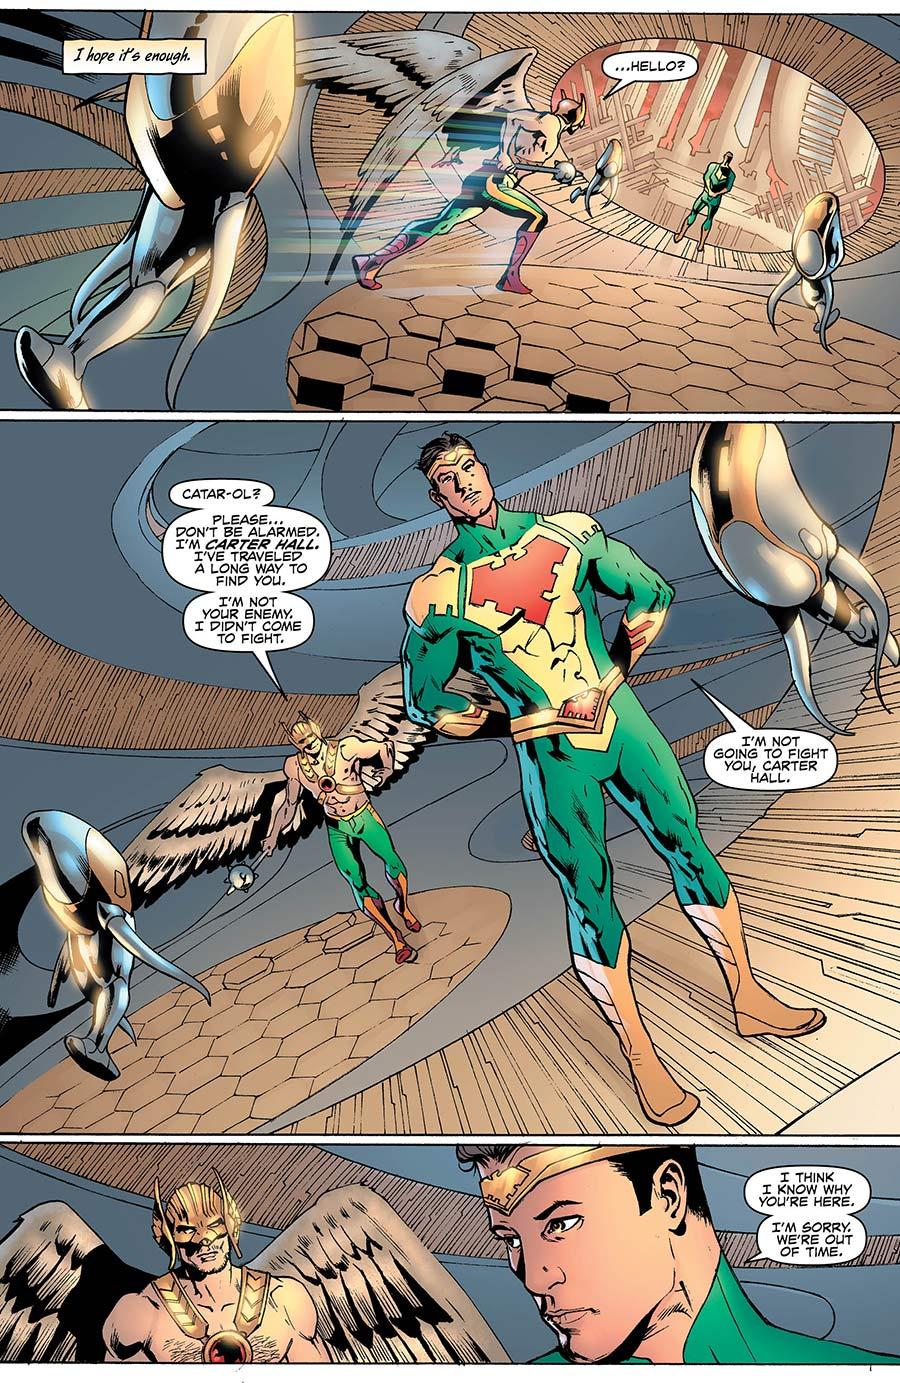 Hawkman_8_3 - DC Comics News